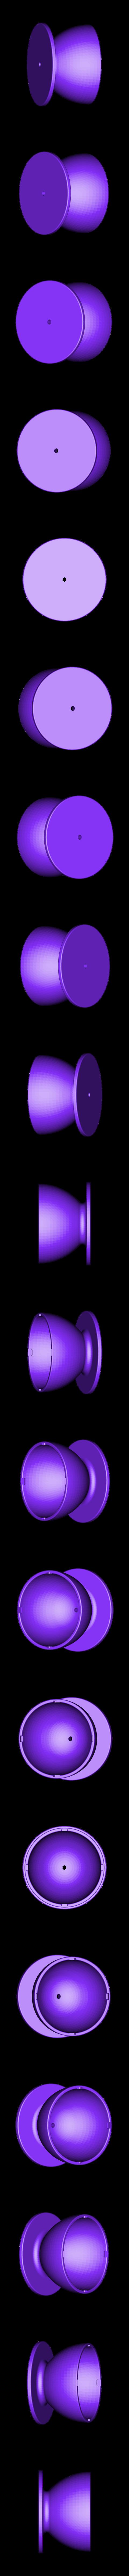 irish_mach_tasse.STL Download free STL file Irish Coffee Machine & mesuring cup • 3D printable design, lulu3Dbuilder